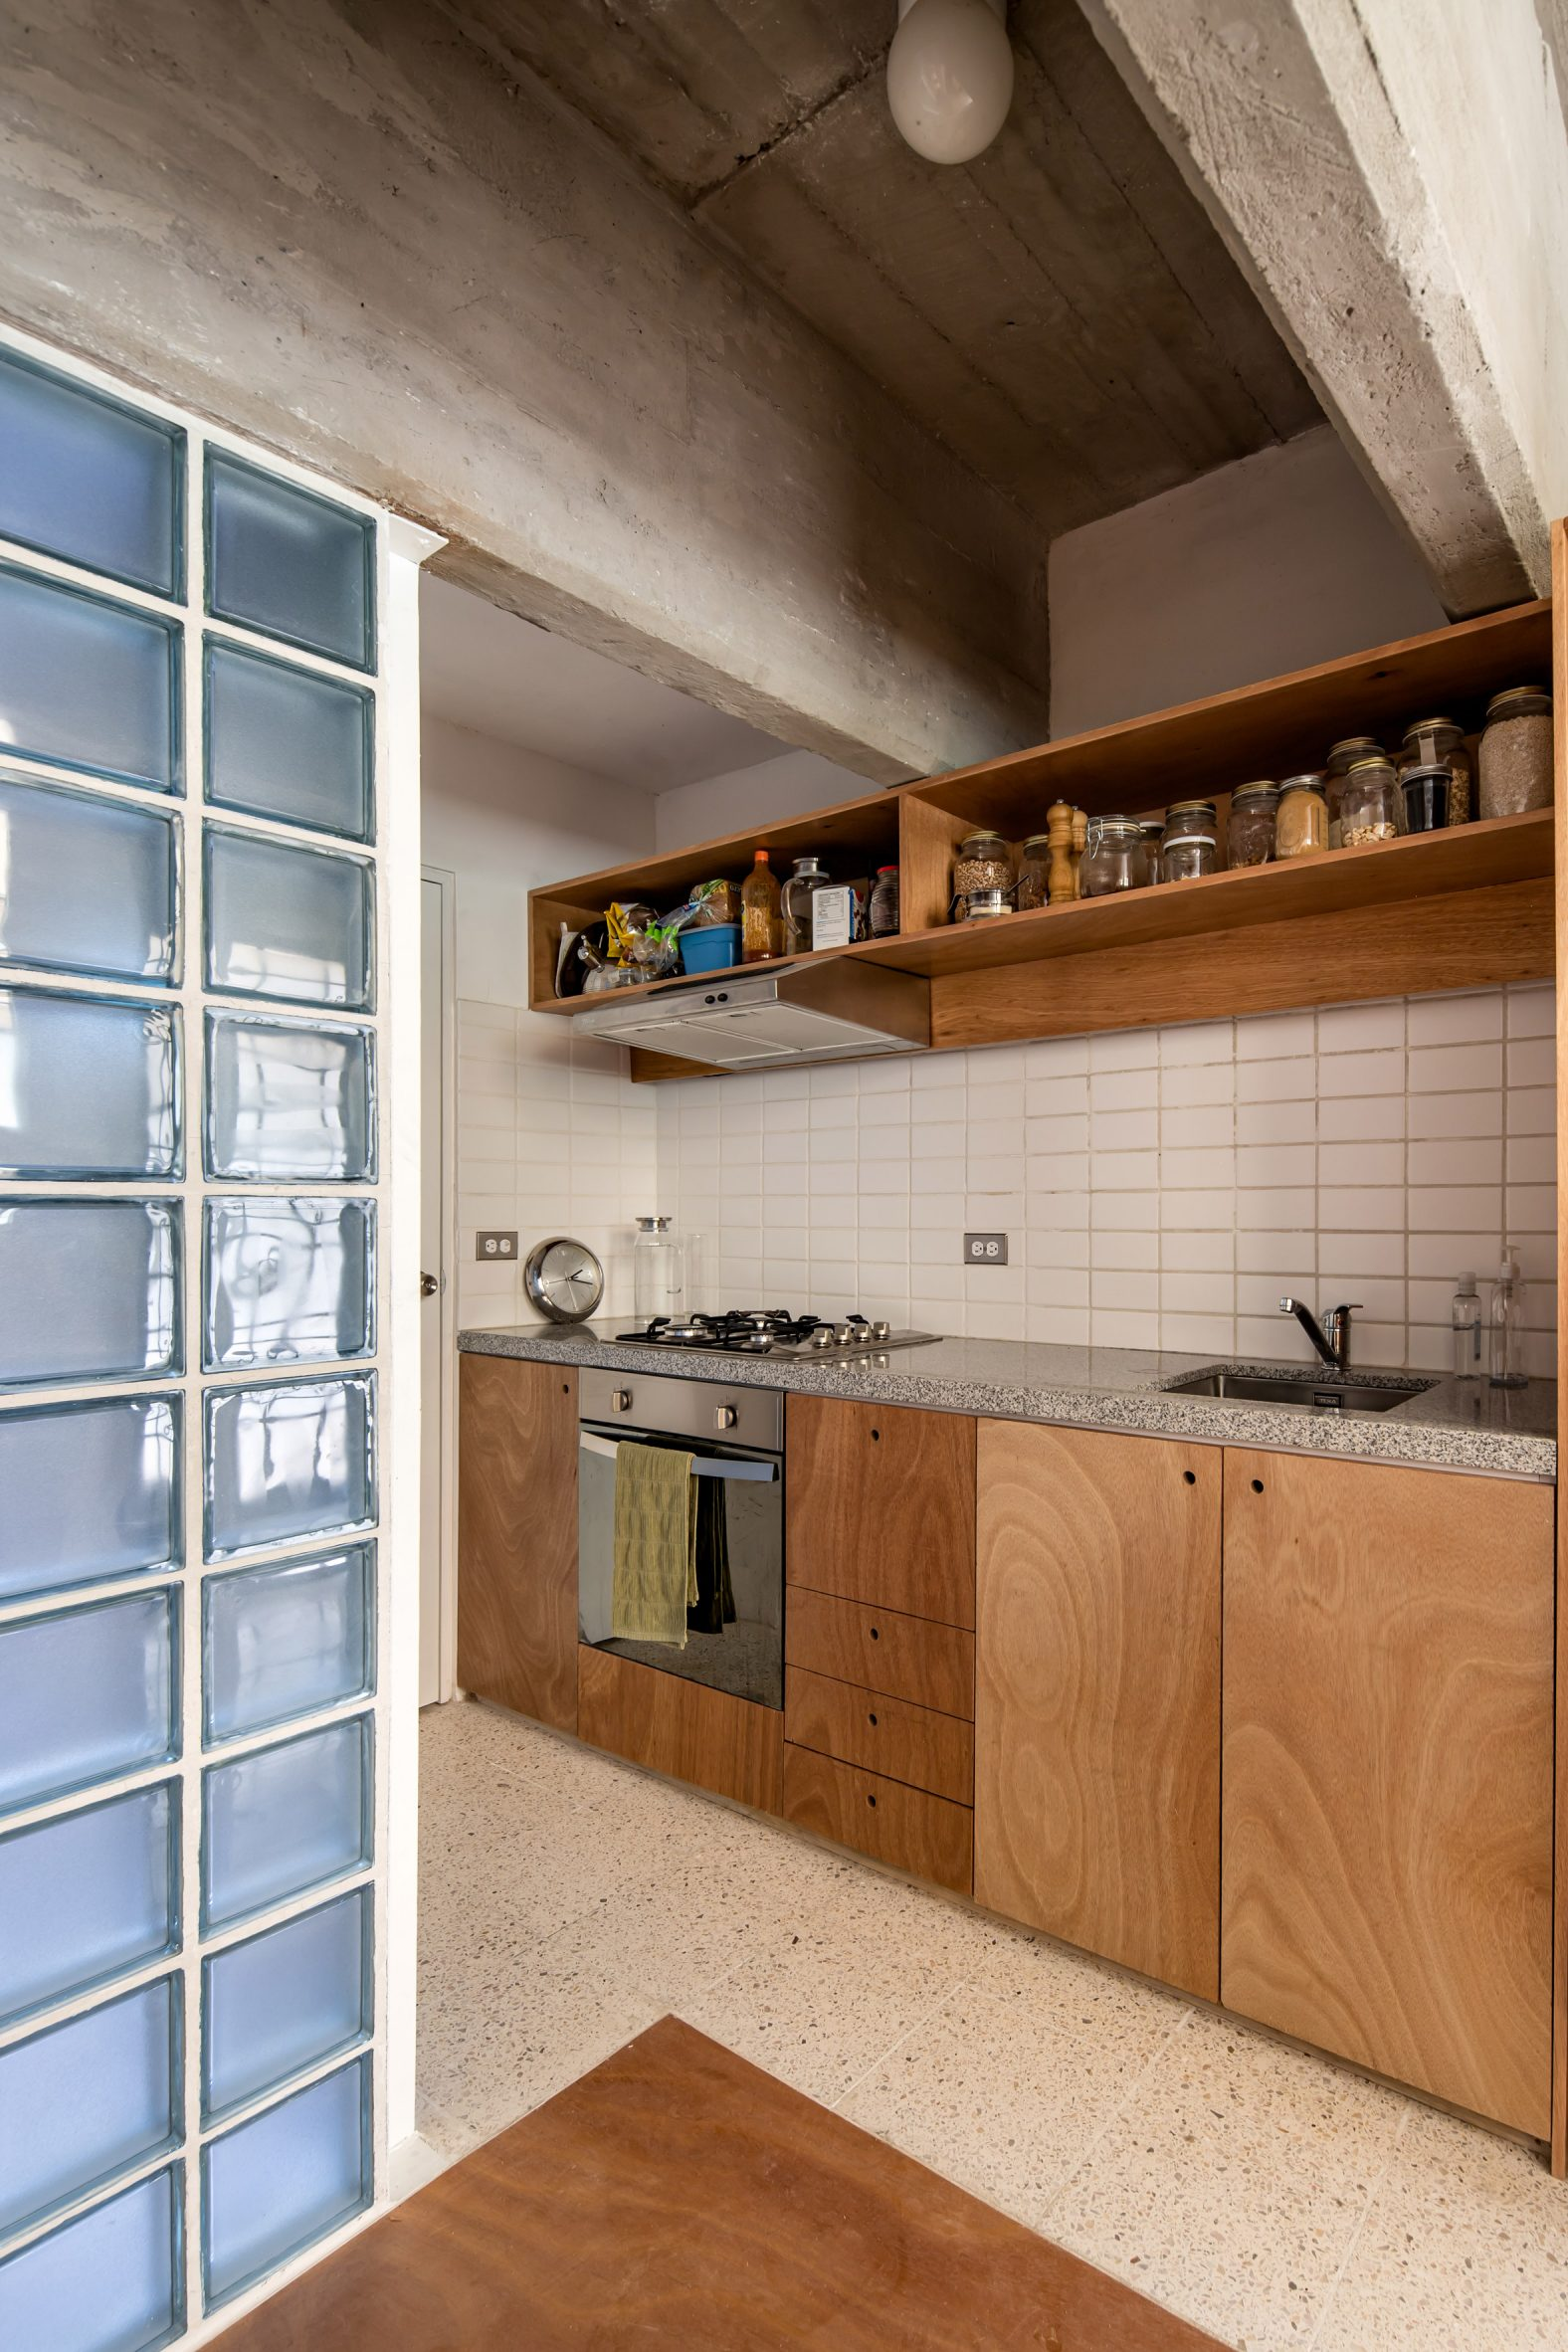 The renovated kitchen by Escobedo Soliz